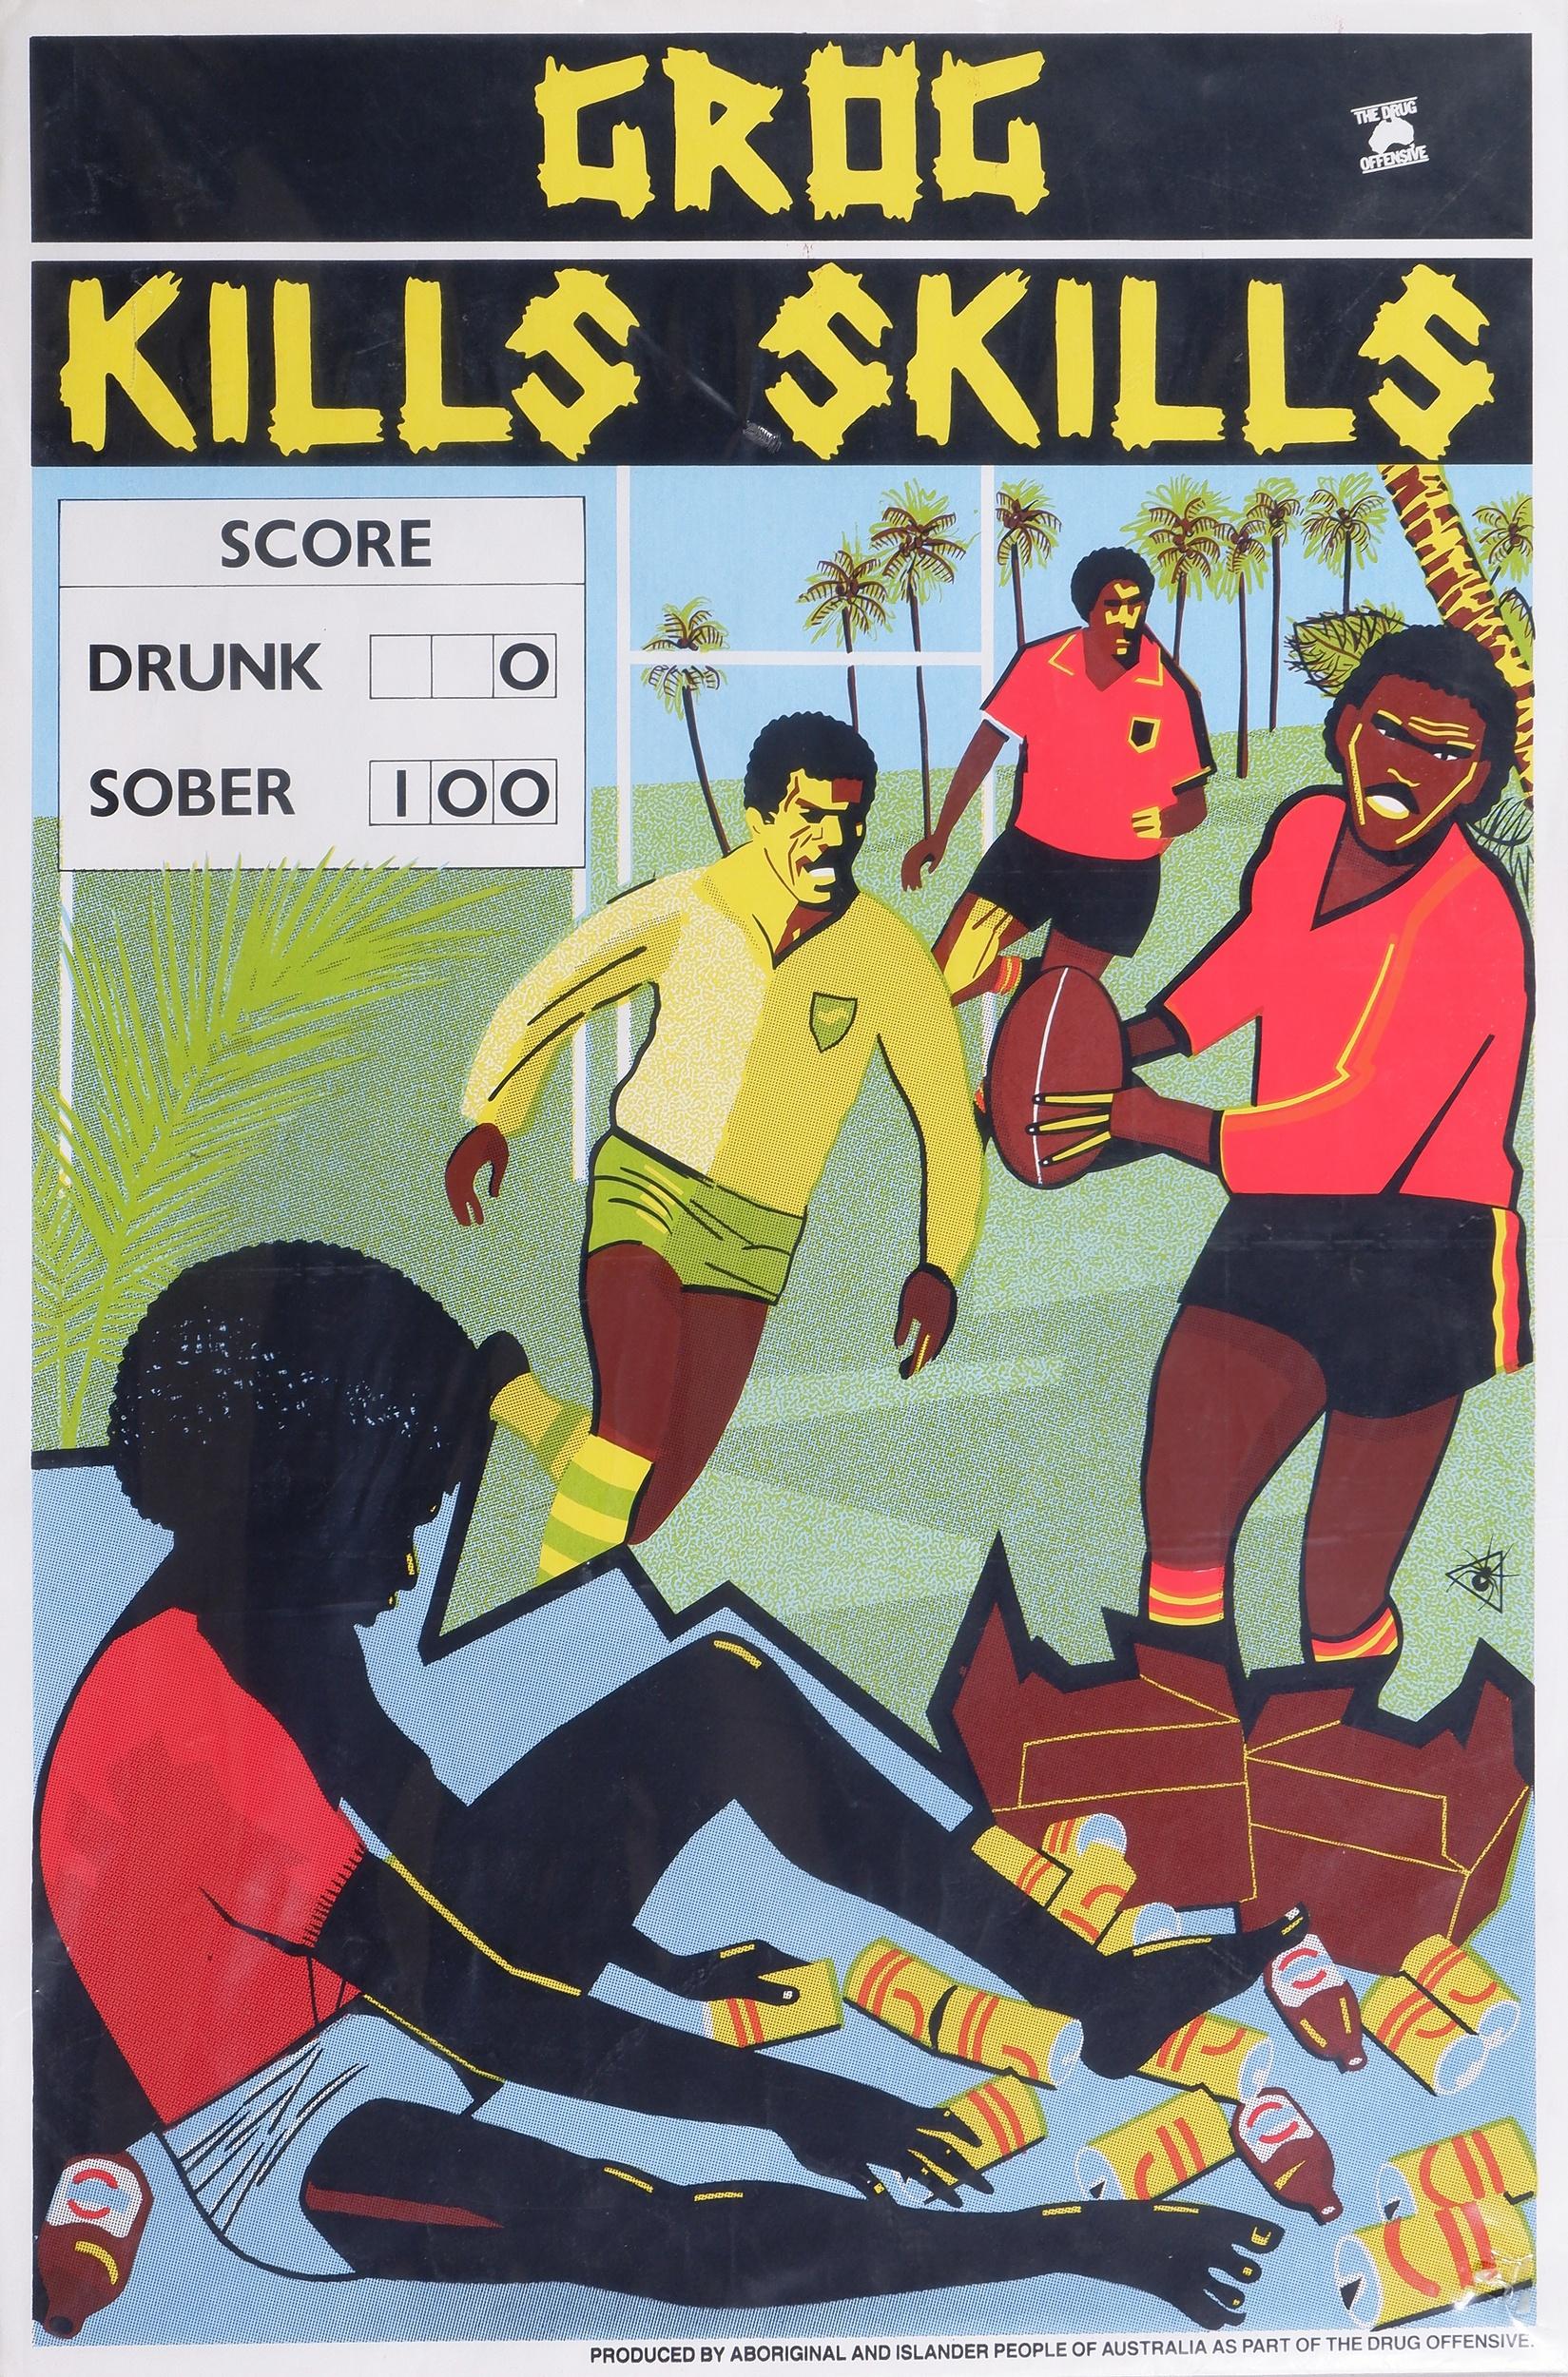 'Marie McMahon (born 1953), Grog Kills Skills, Football 1988, Colour Screenprint'